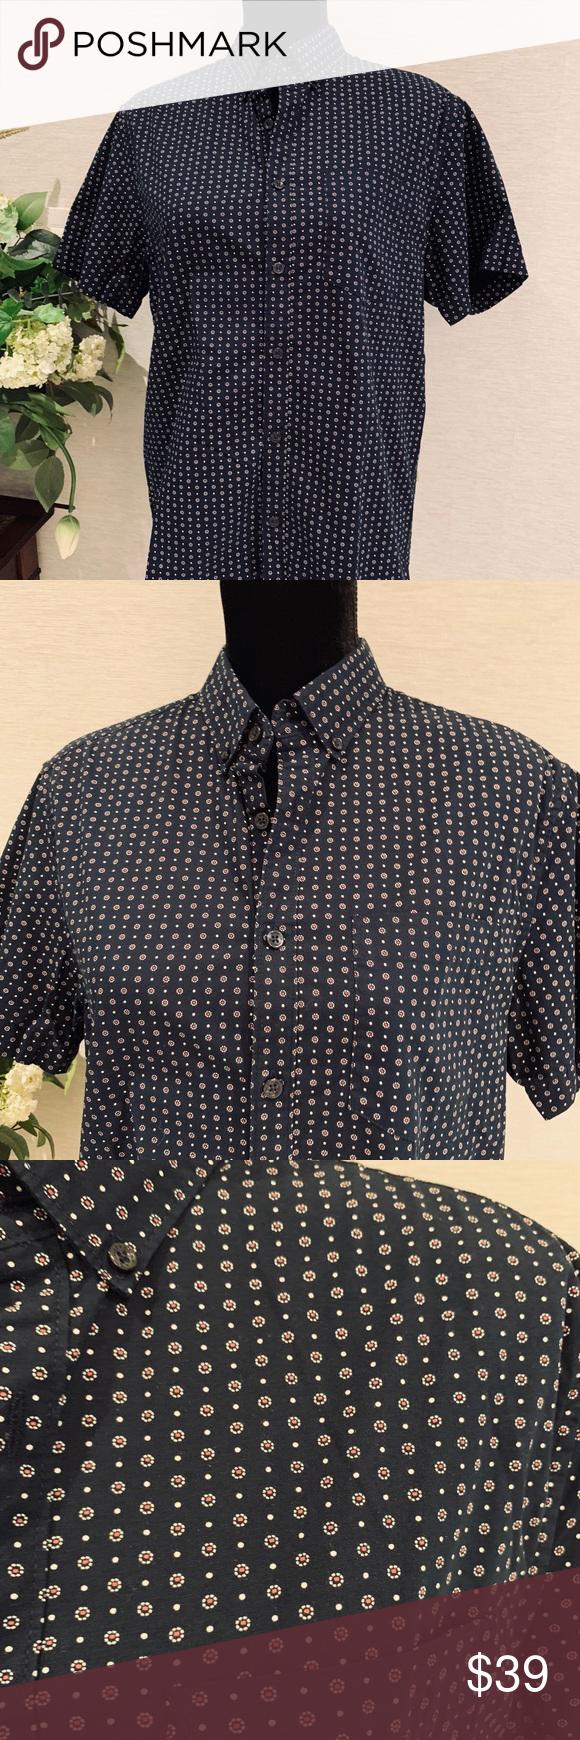 e4d79bd2899 Men s Sz M Navy Blue Denim   Flower Slim Fit A beautiful daisy pattern  delicately adorns